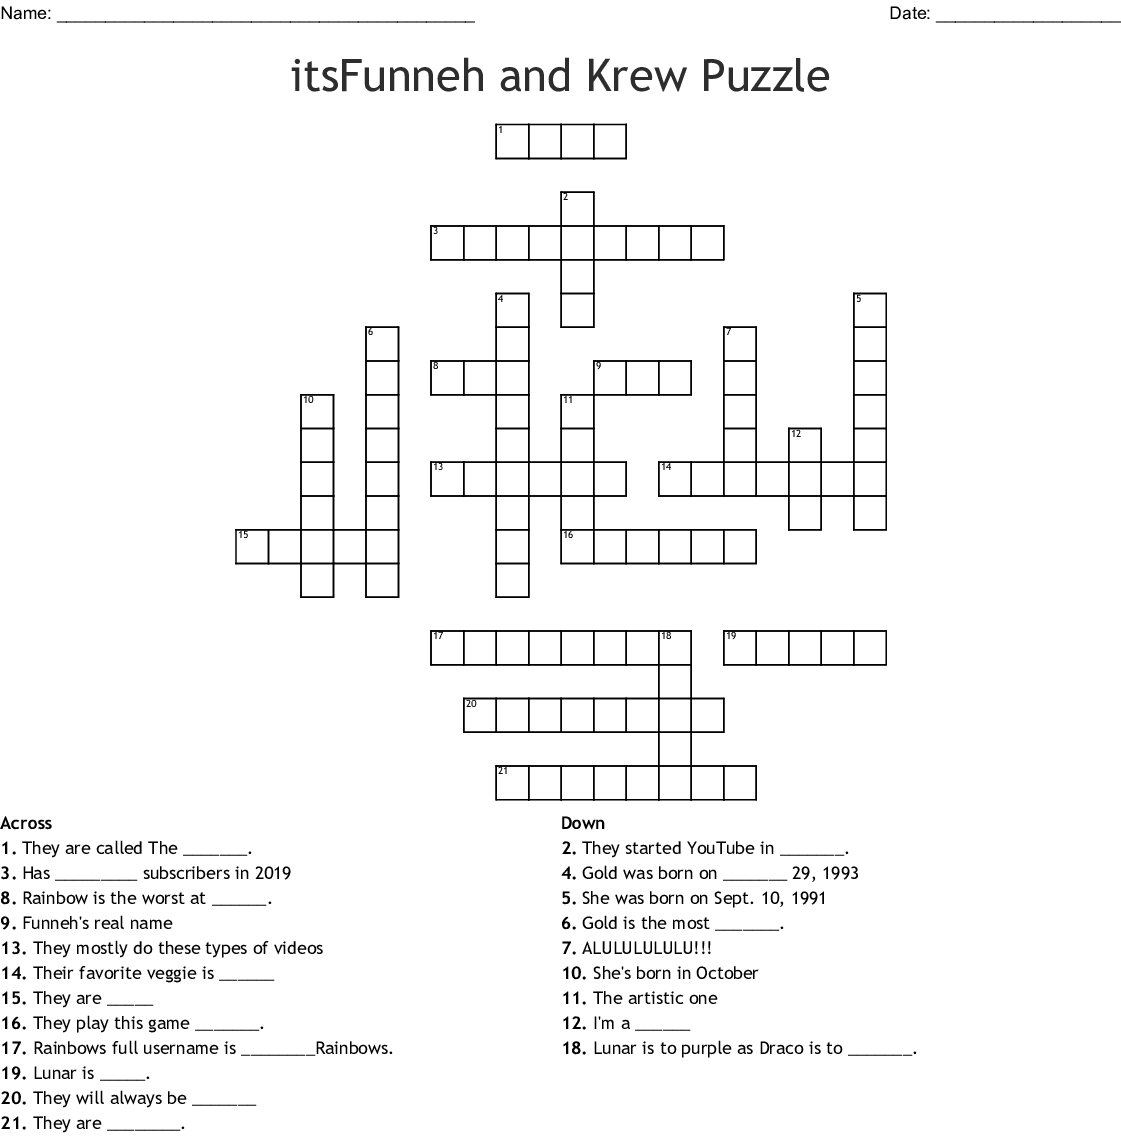 Itsfunneh And Krew Puzzle Crossword Wordmint